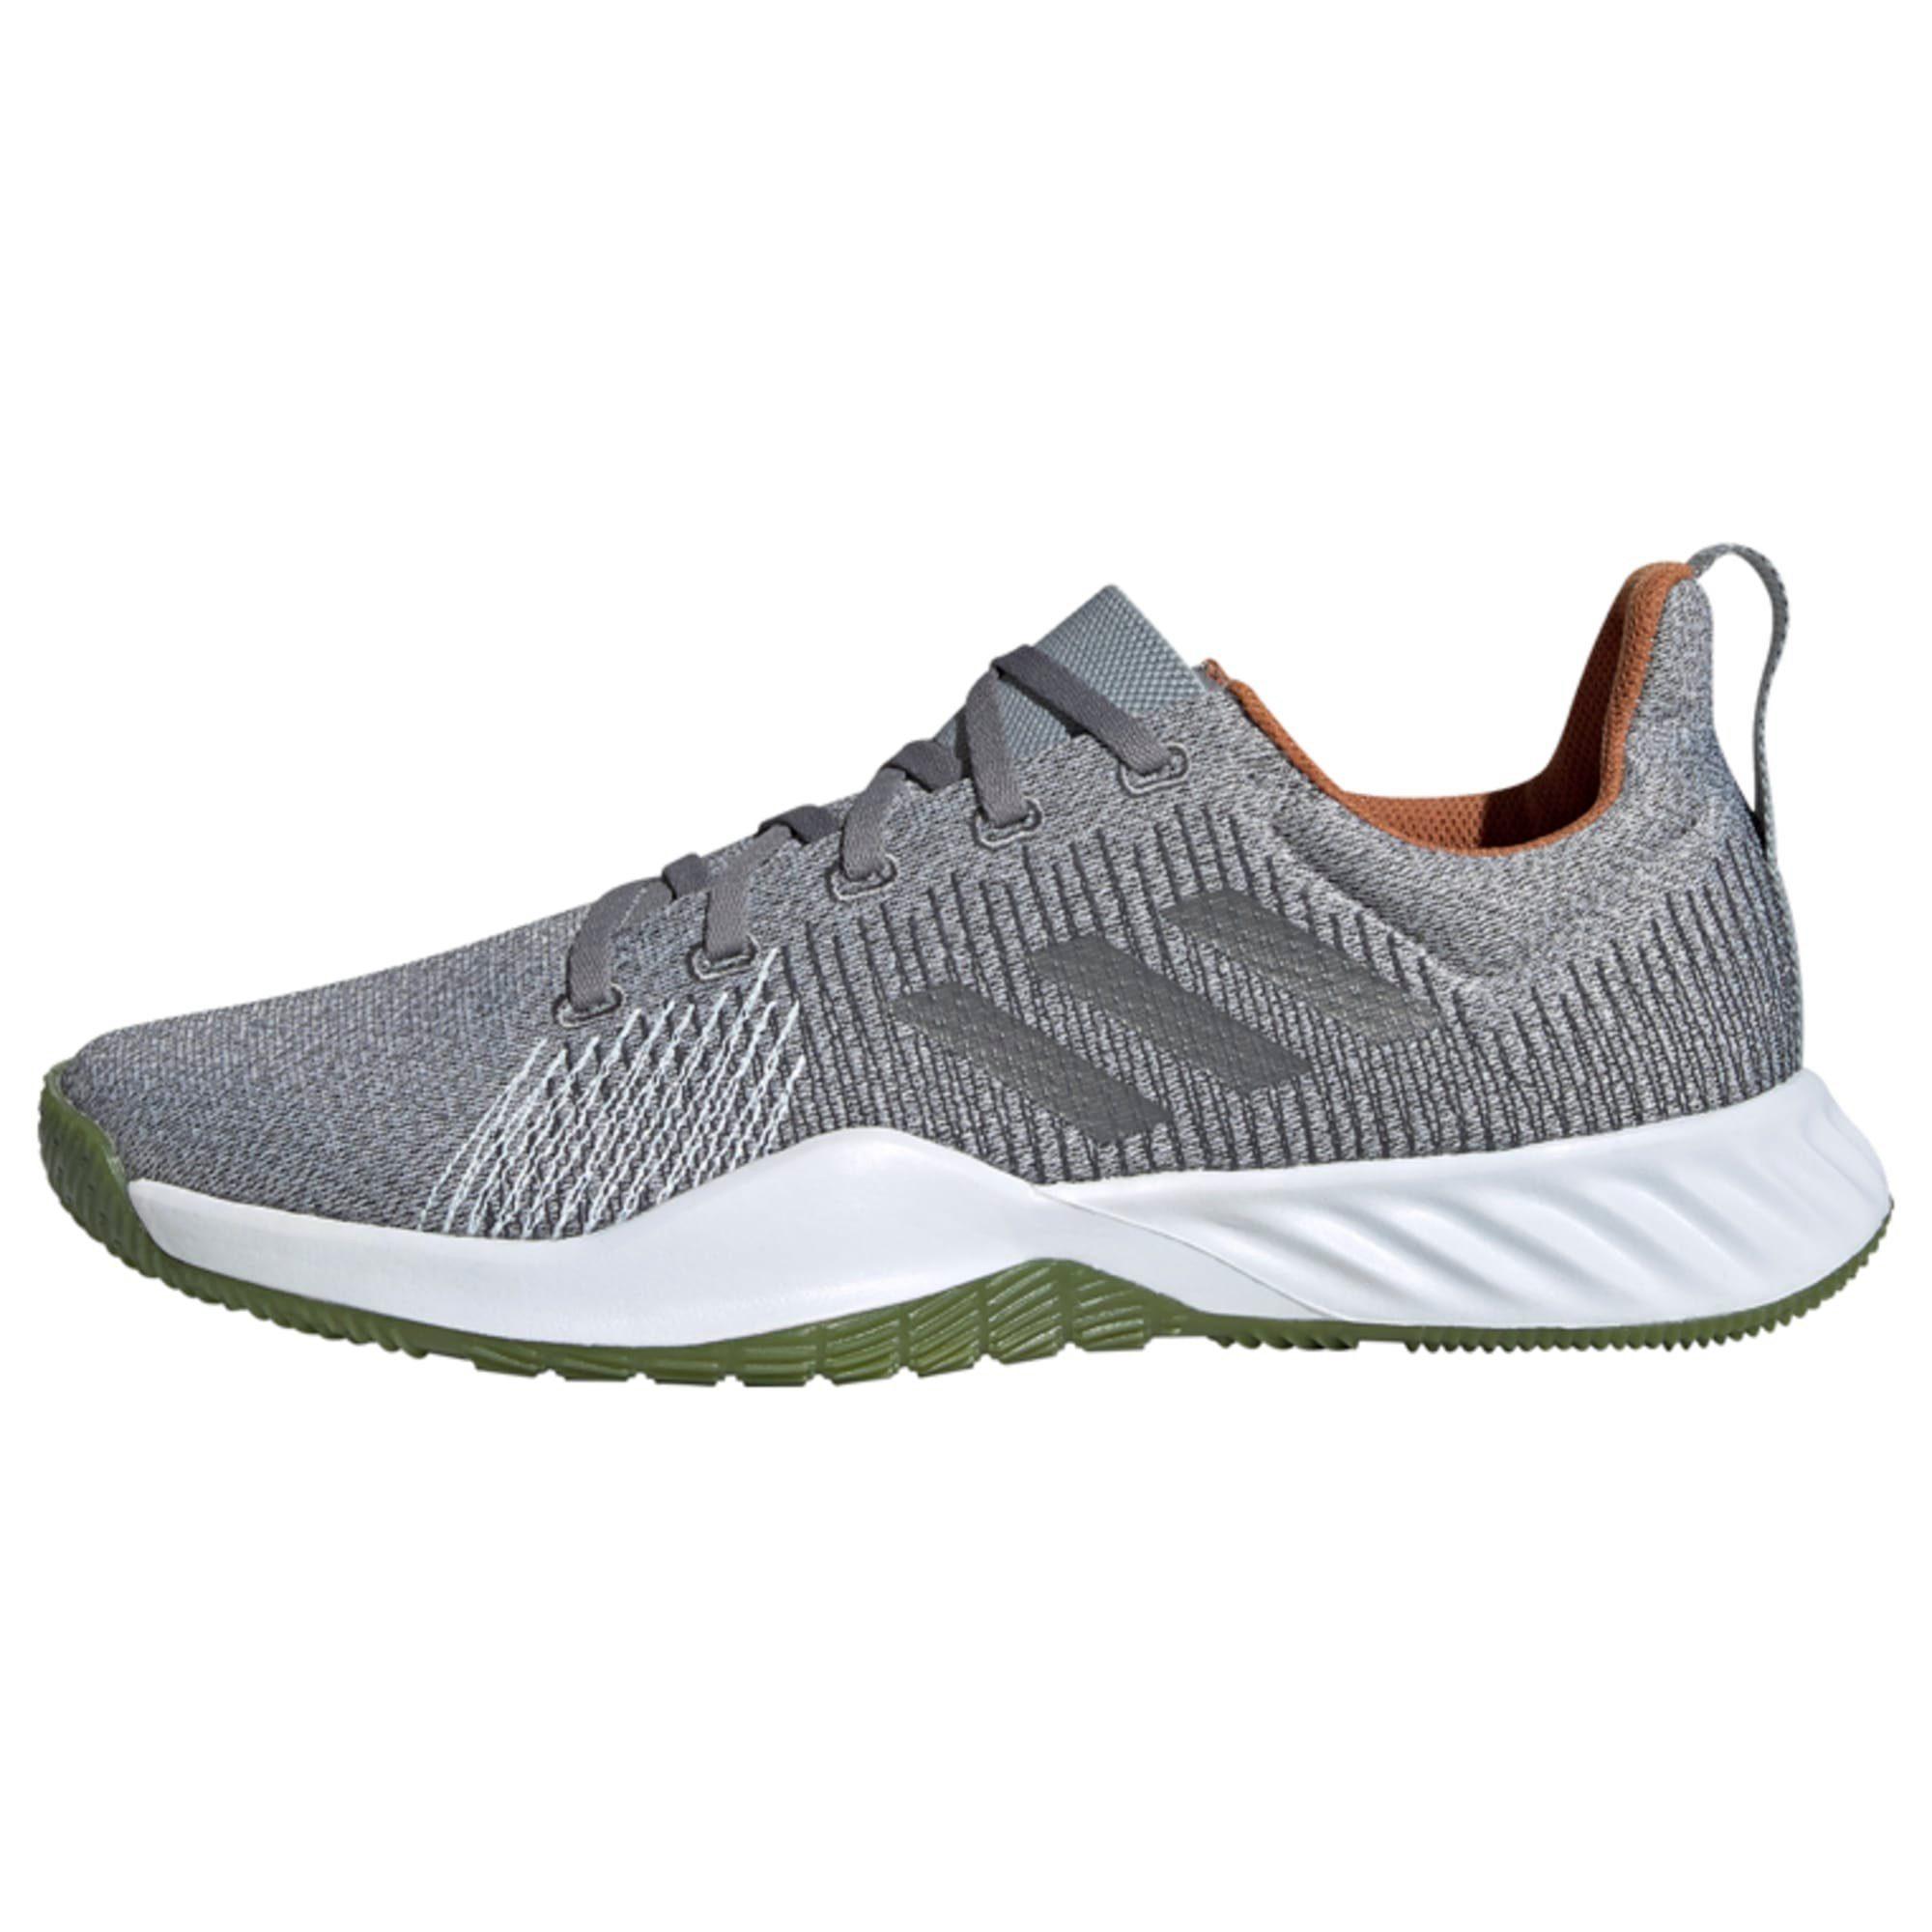 Unisex adidas Performance »Solar LT Schuh« Trainingsschuh Trainingsschuh    04061622804212